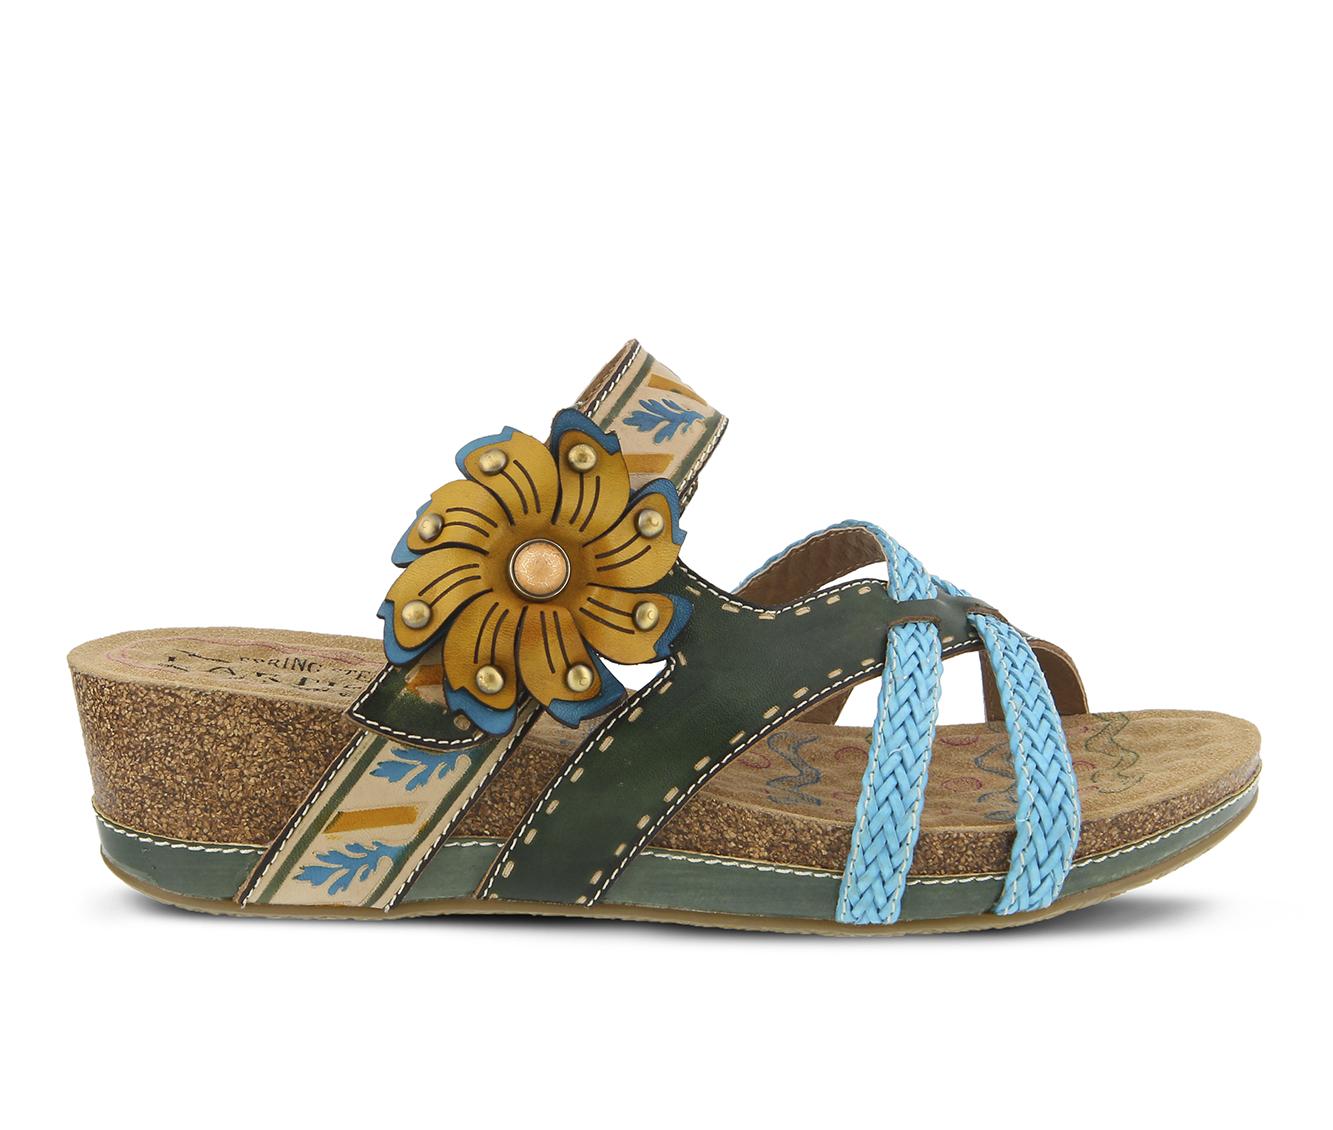 L'Artiste Deonna Women's Sandal (Green Leather)